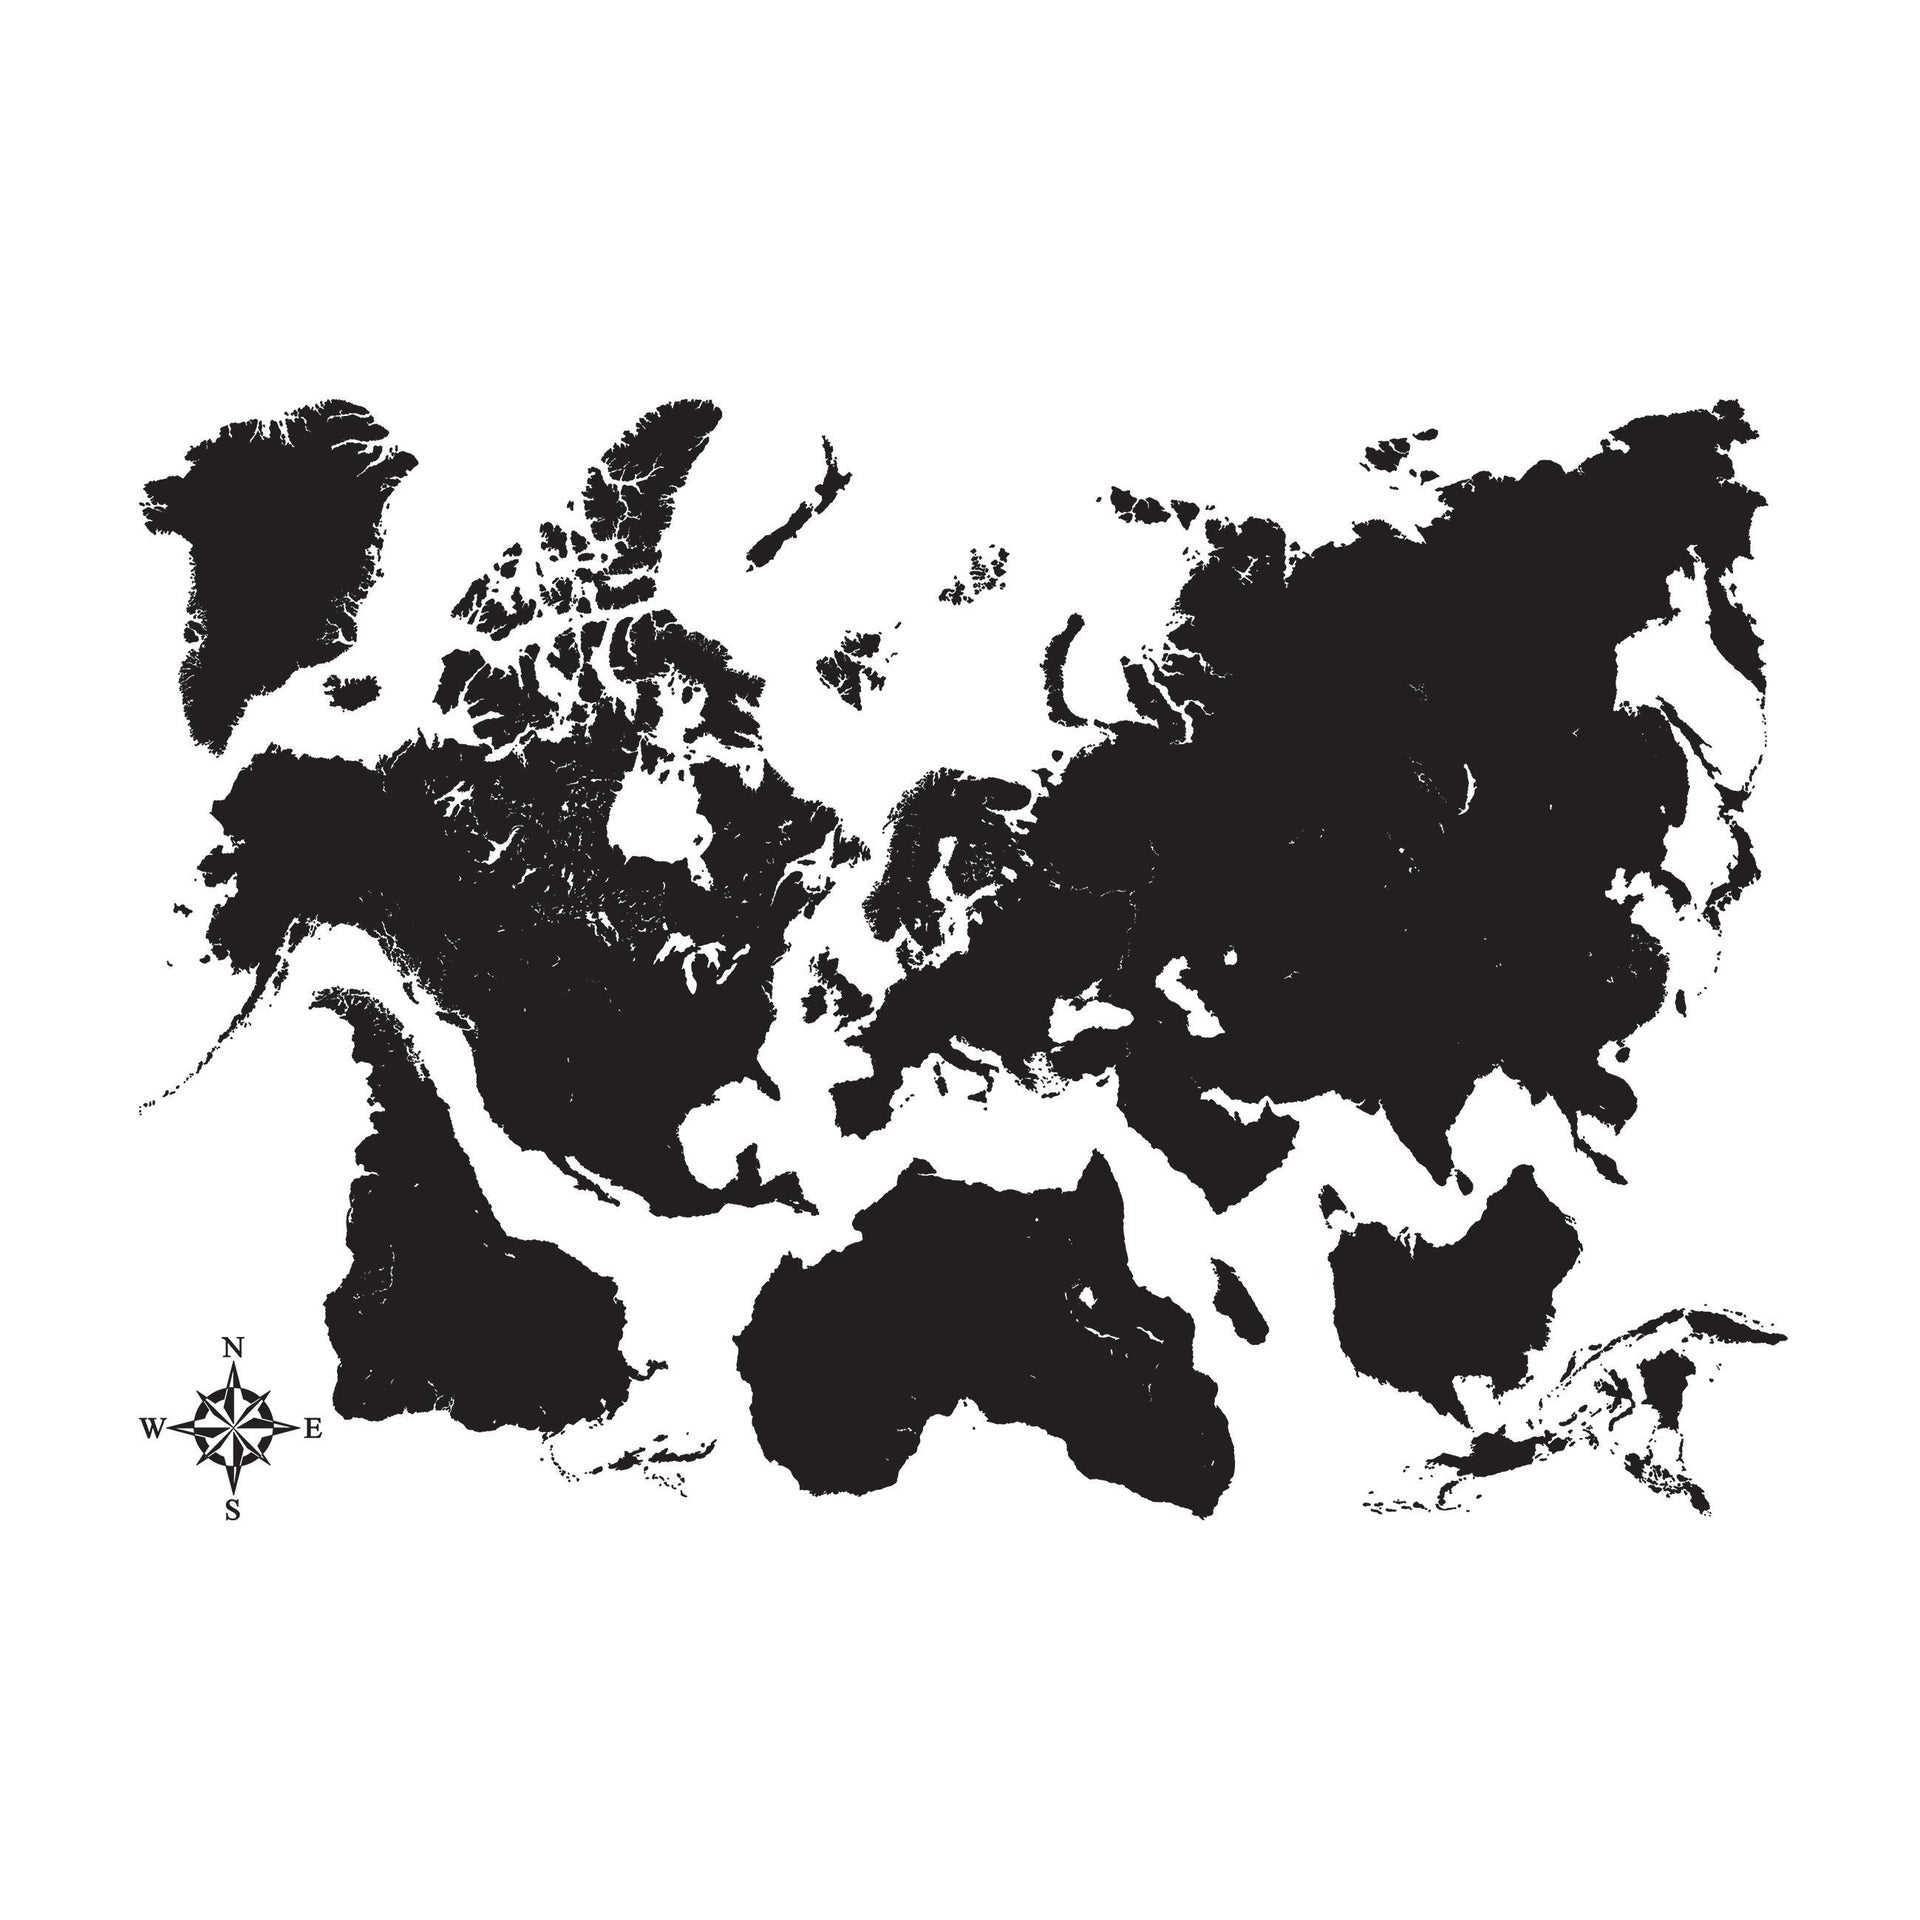 Sticker Mappa Nera 47x67 cm - 2